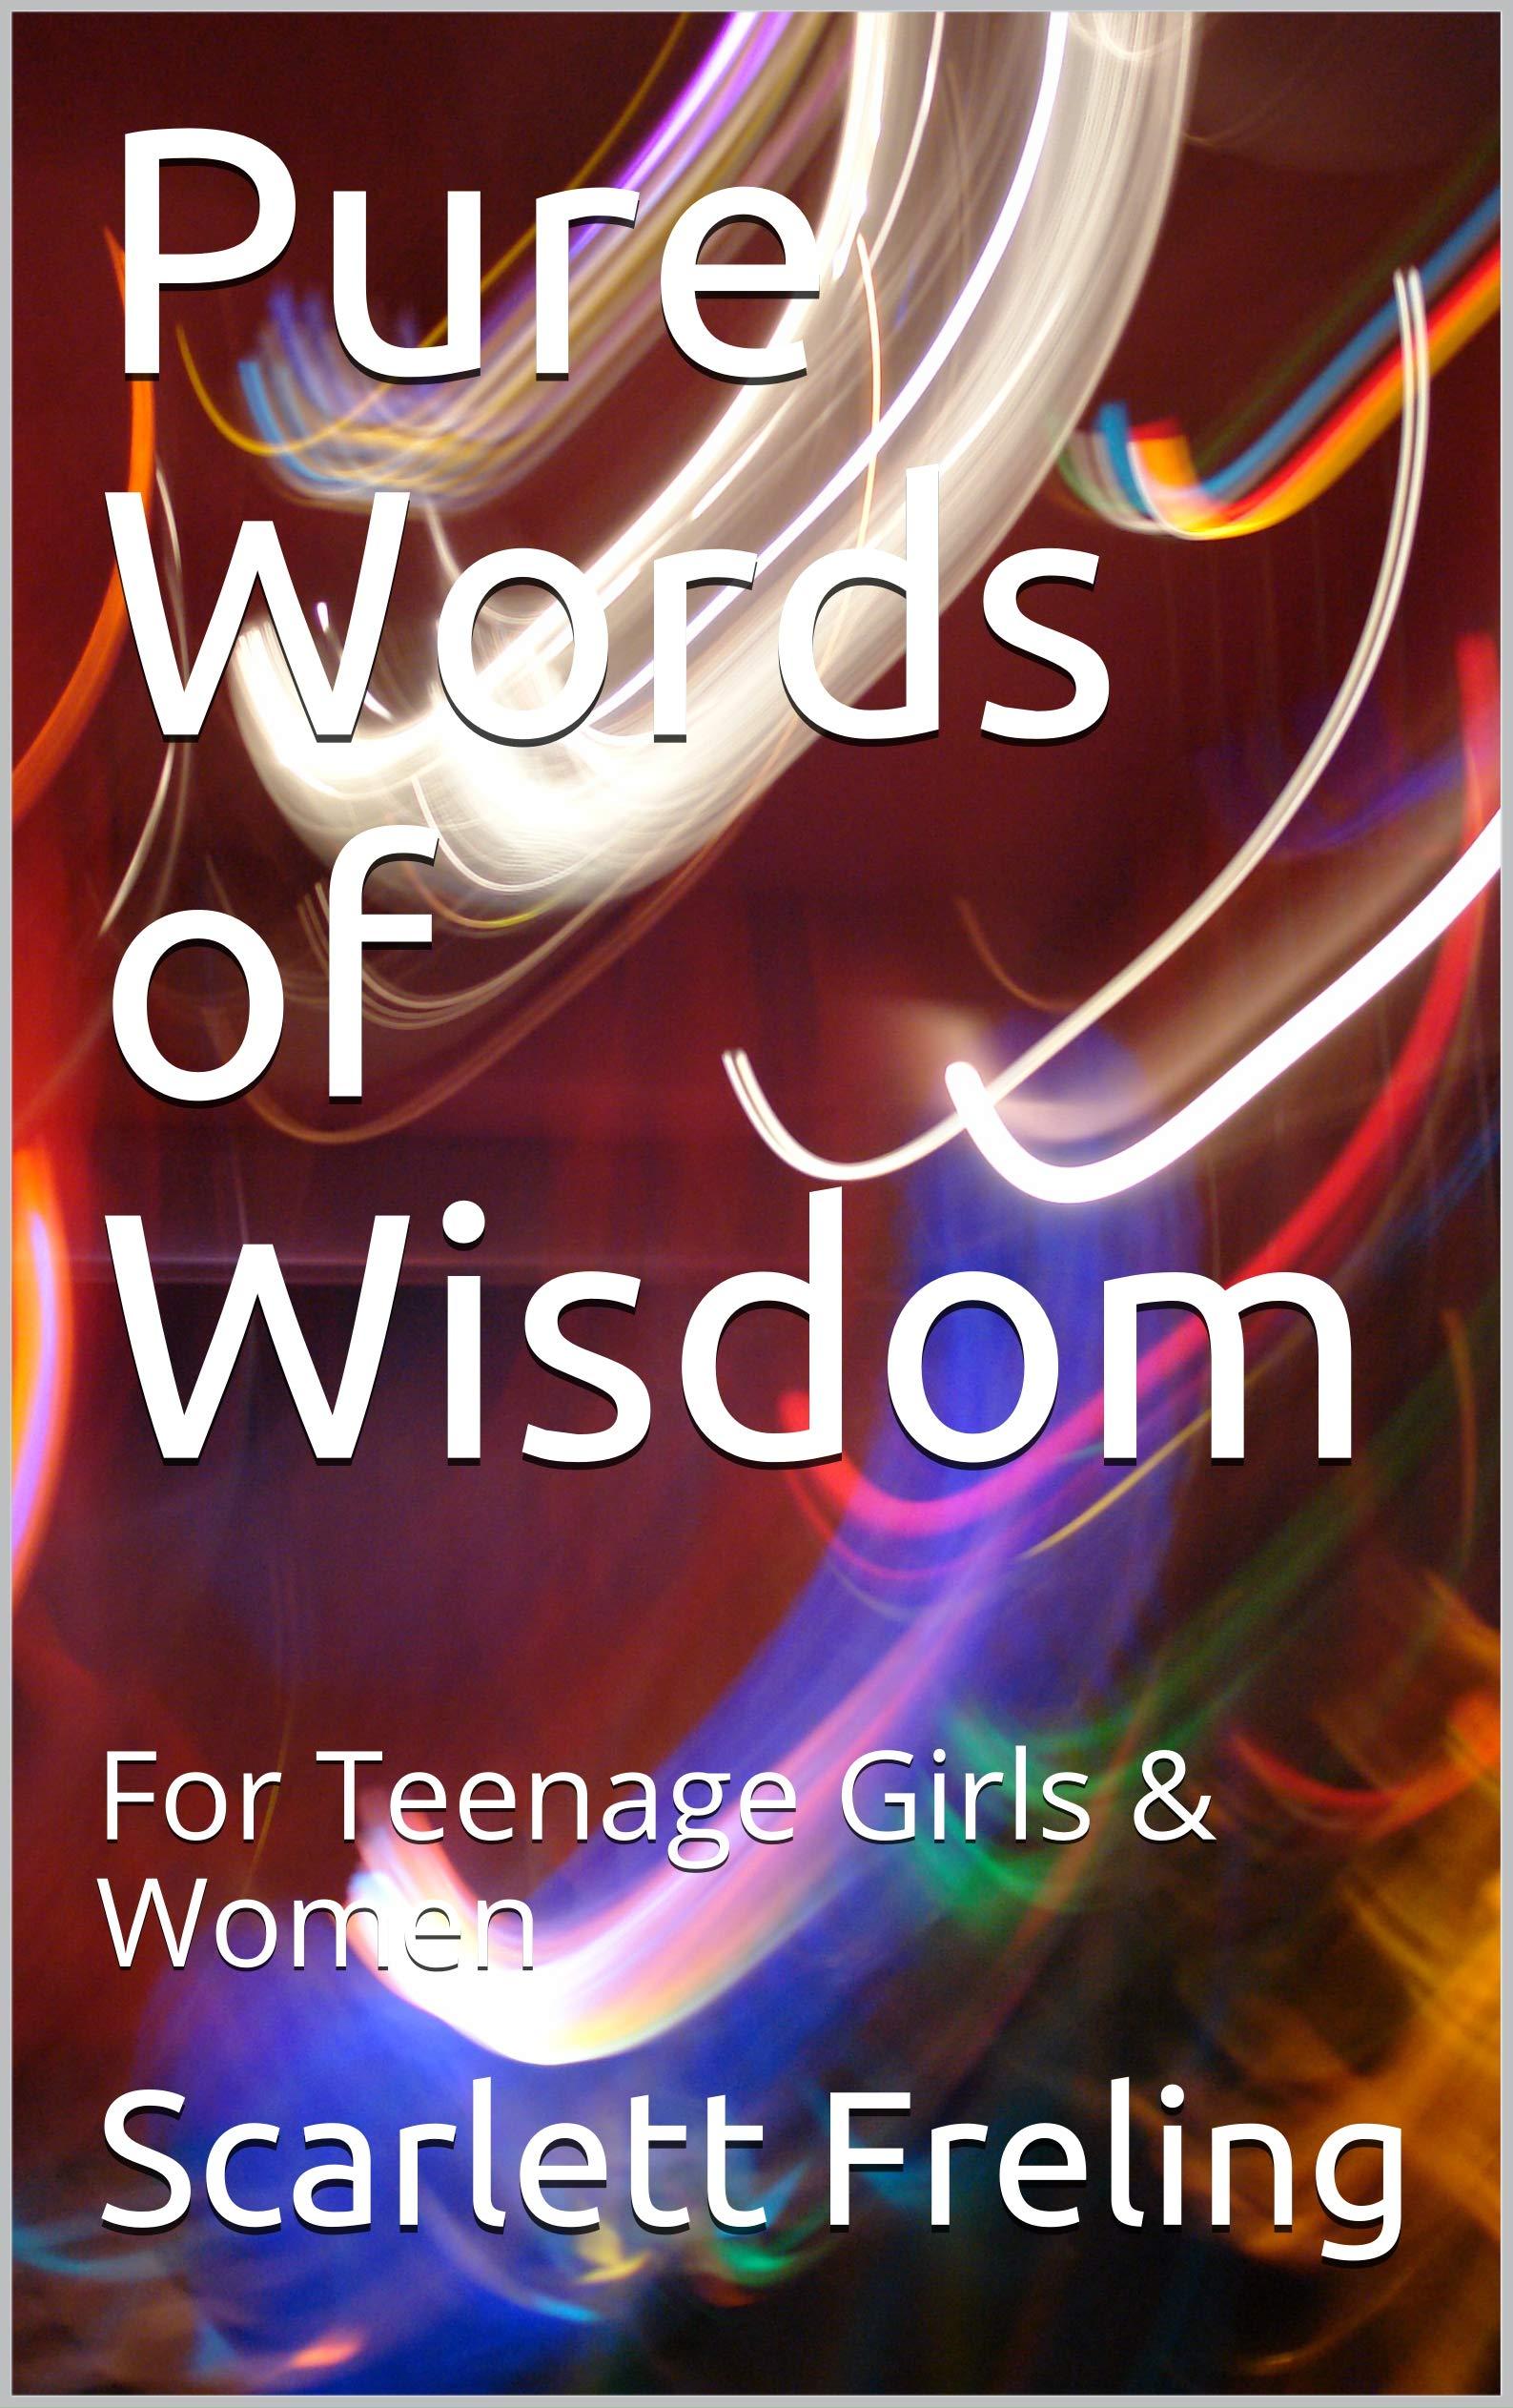 Pure Words of Wisdom: For Teenage Girls & Women